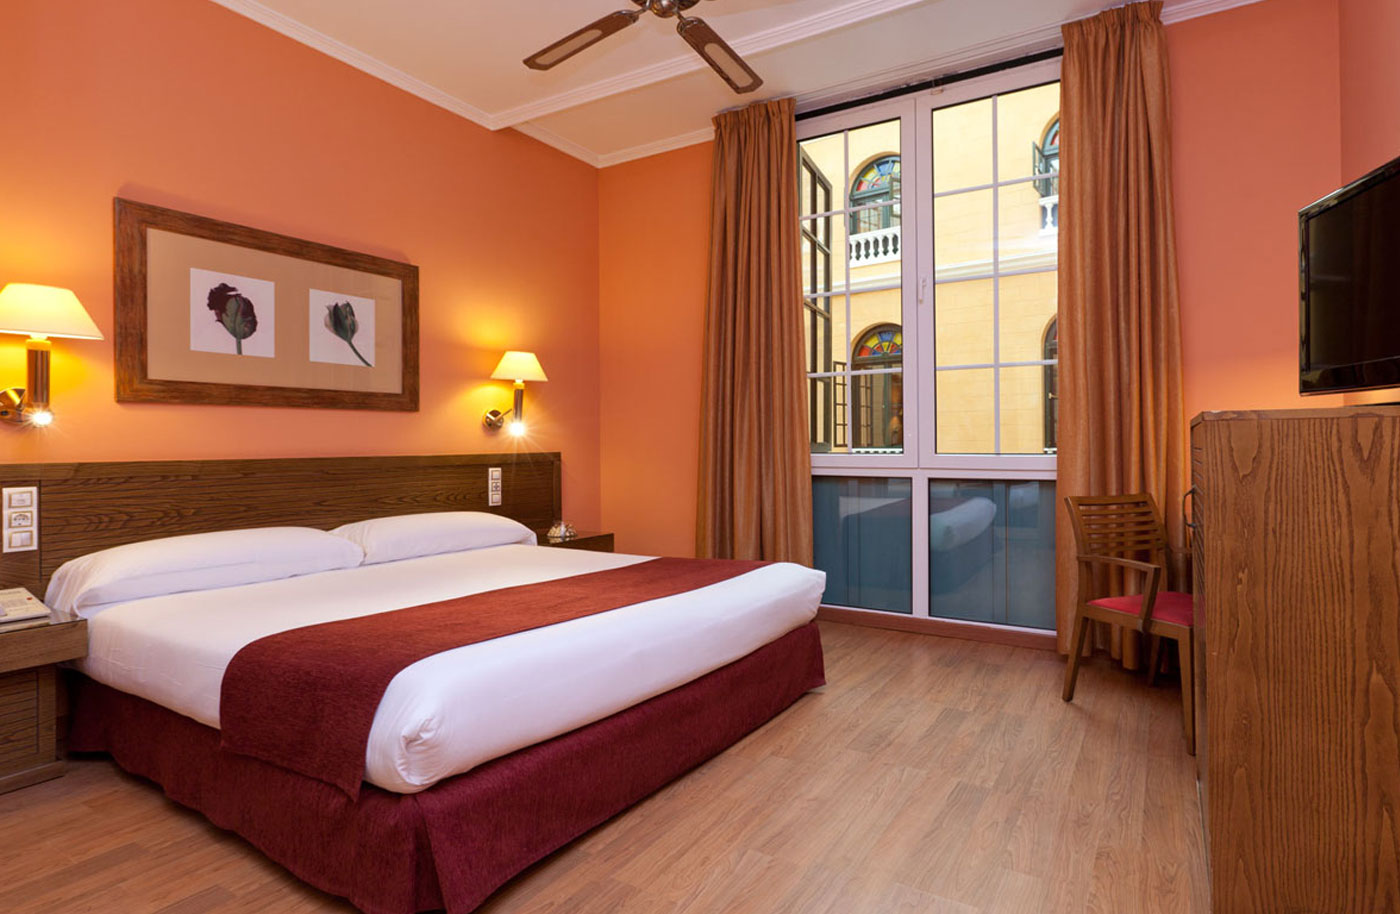 Rooms senator c diz spa hotel official website for Ver habitaciones de hoteles